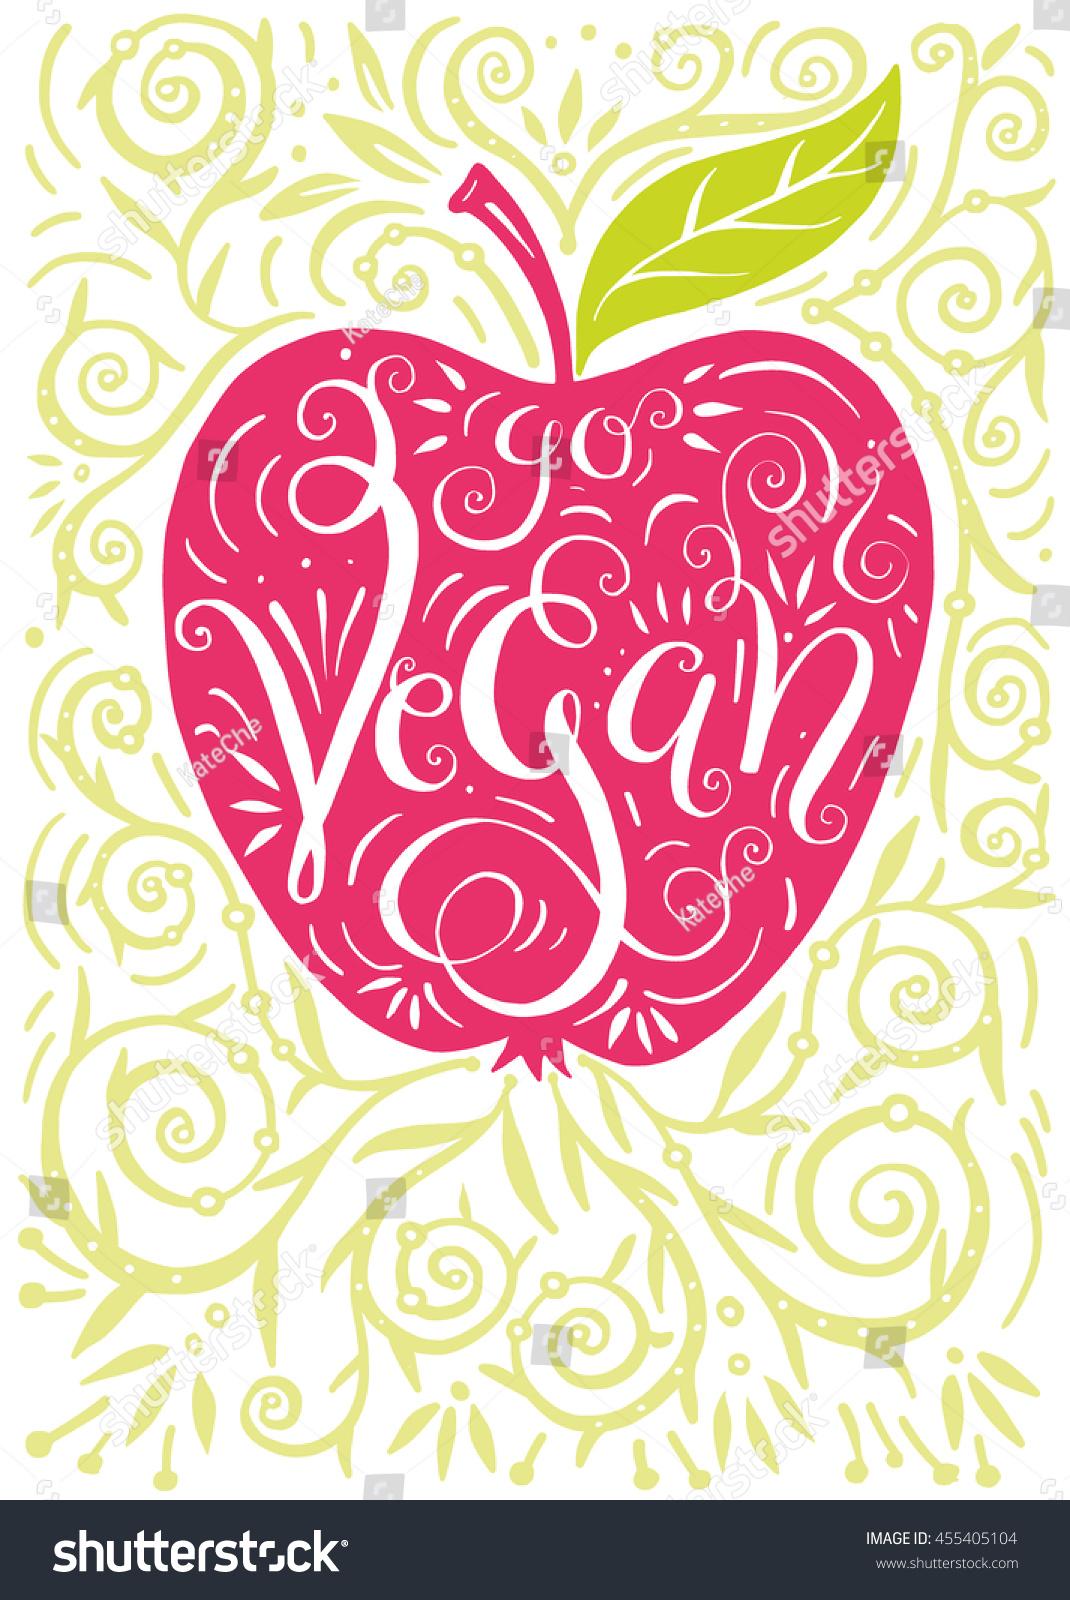 go vegan poster vector illustration apple stock vector 455405104